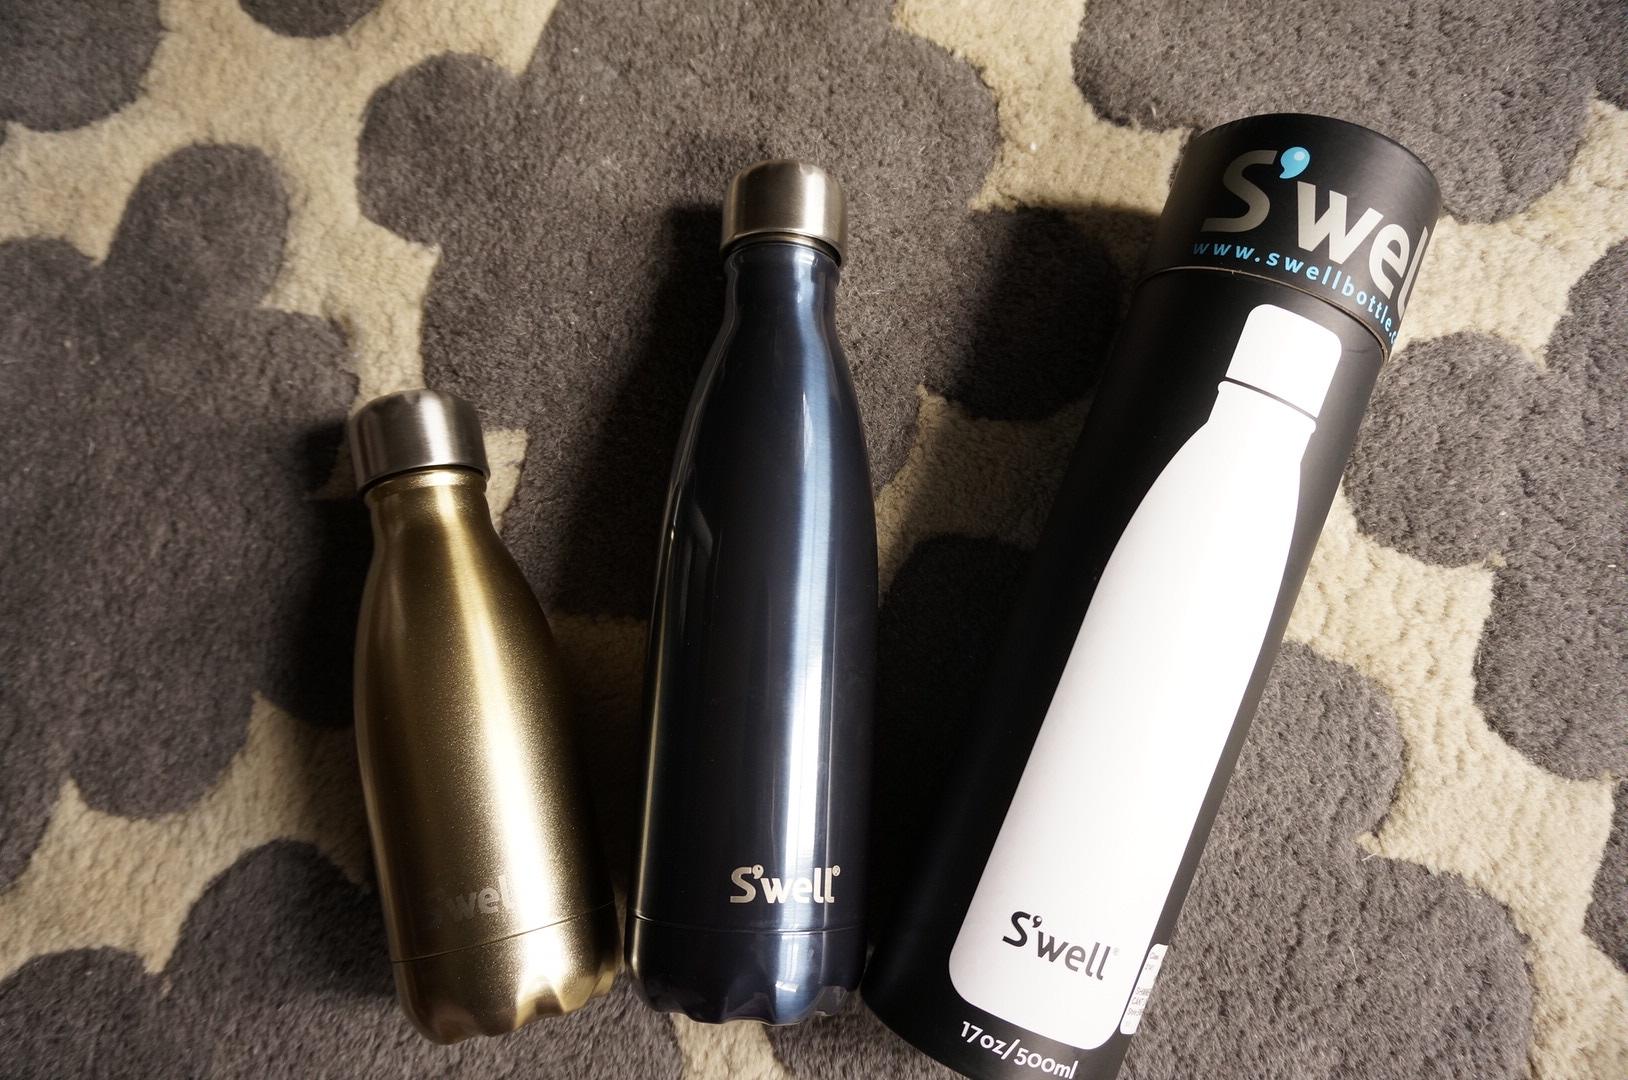 swell bottle 2